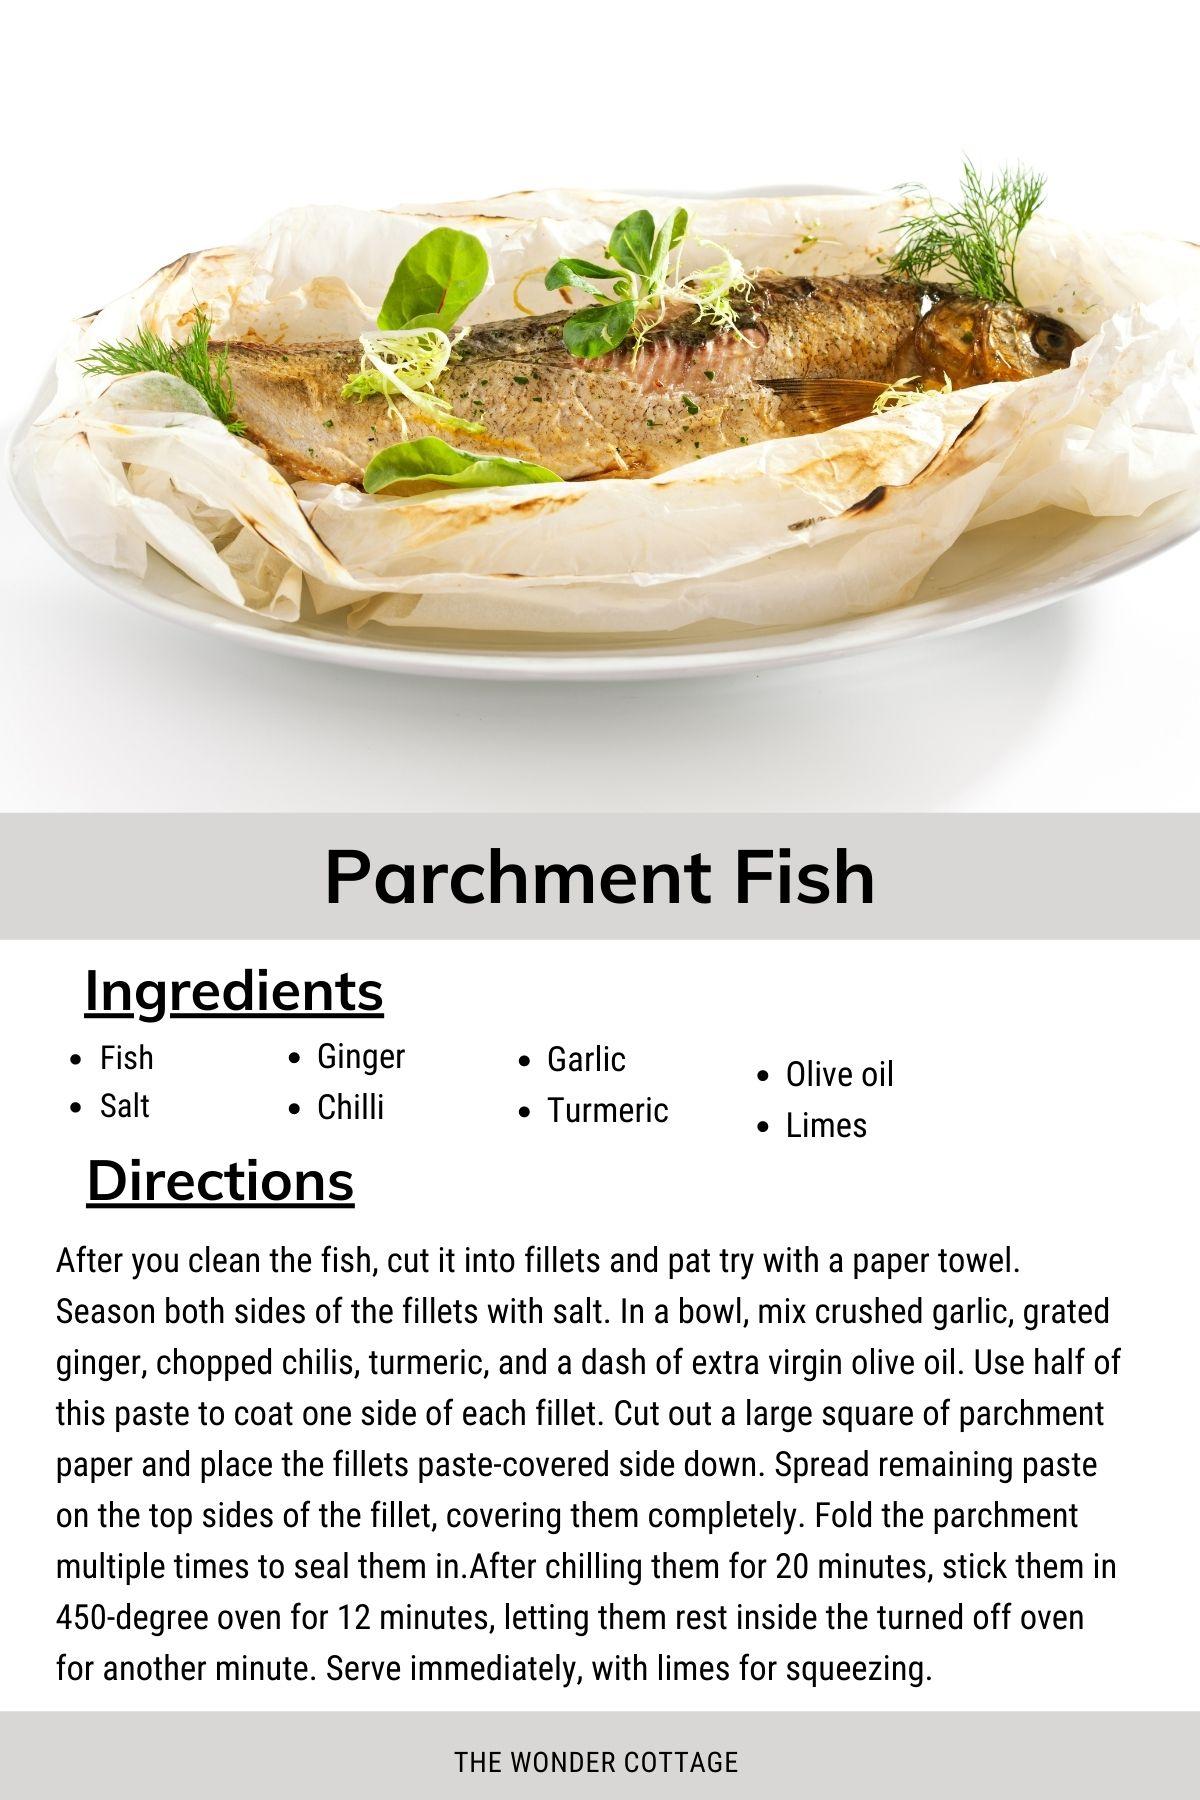 parchment fish recipes